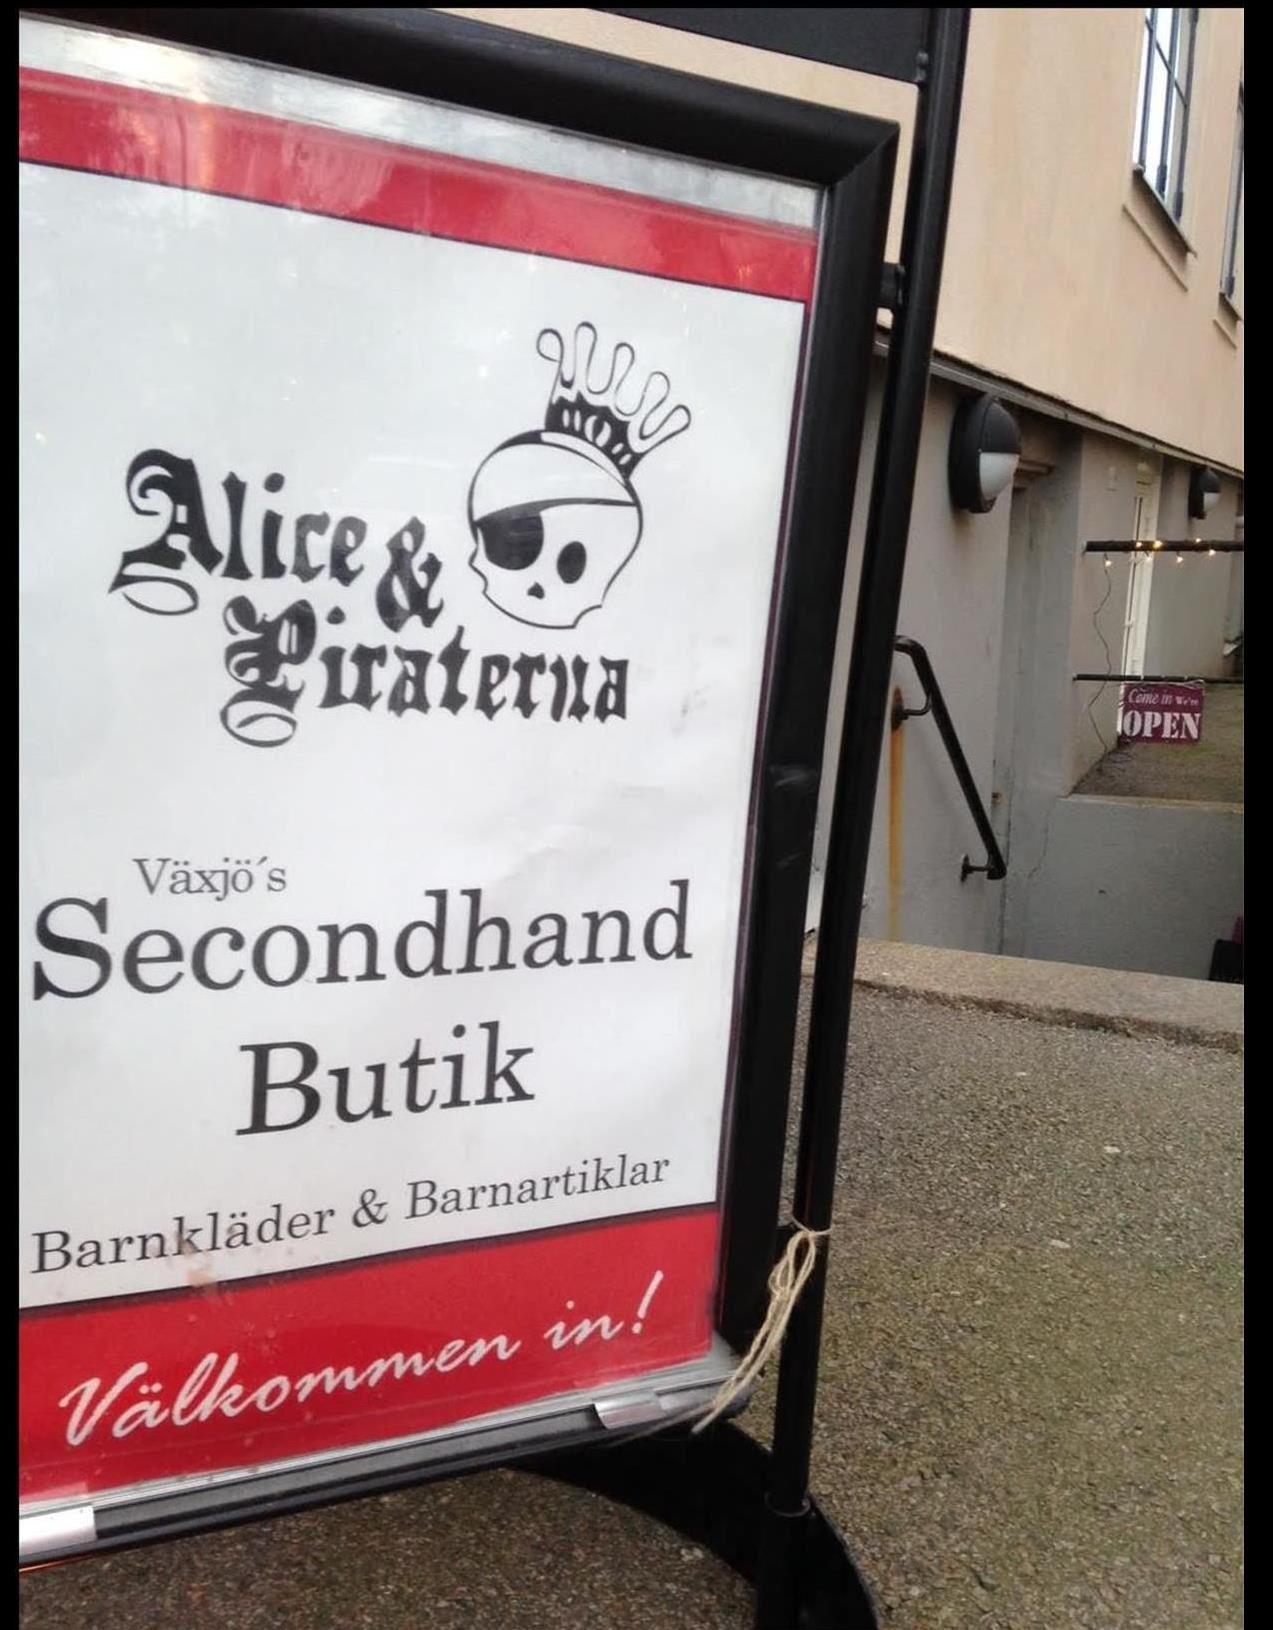 Butiken Alice & Piraterna